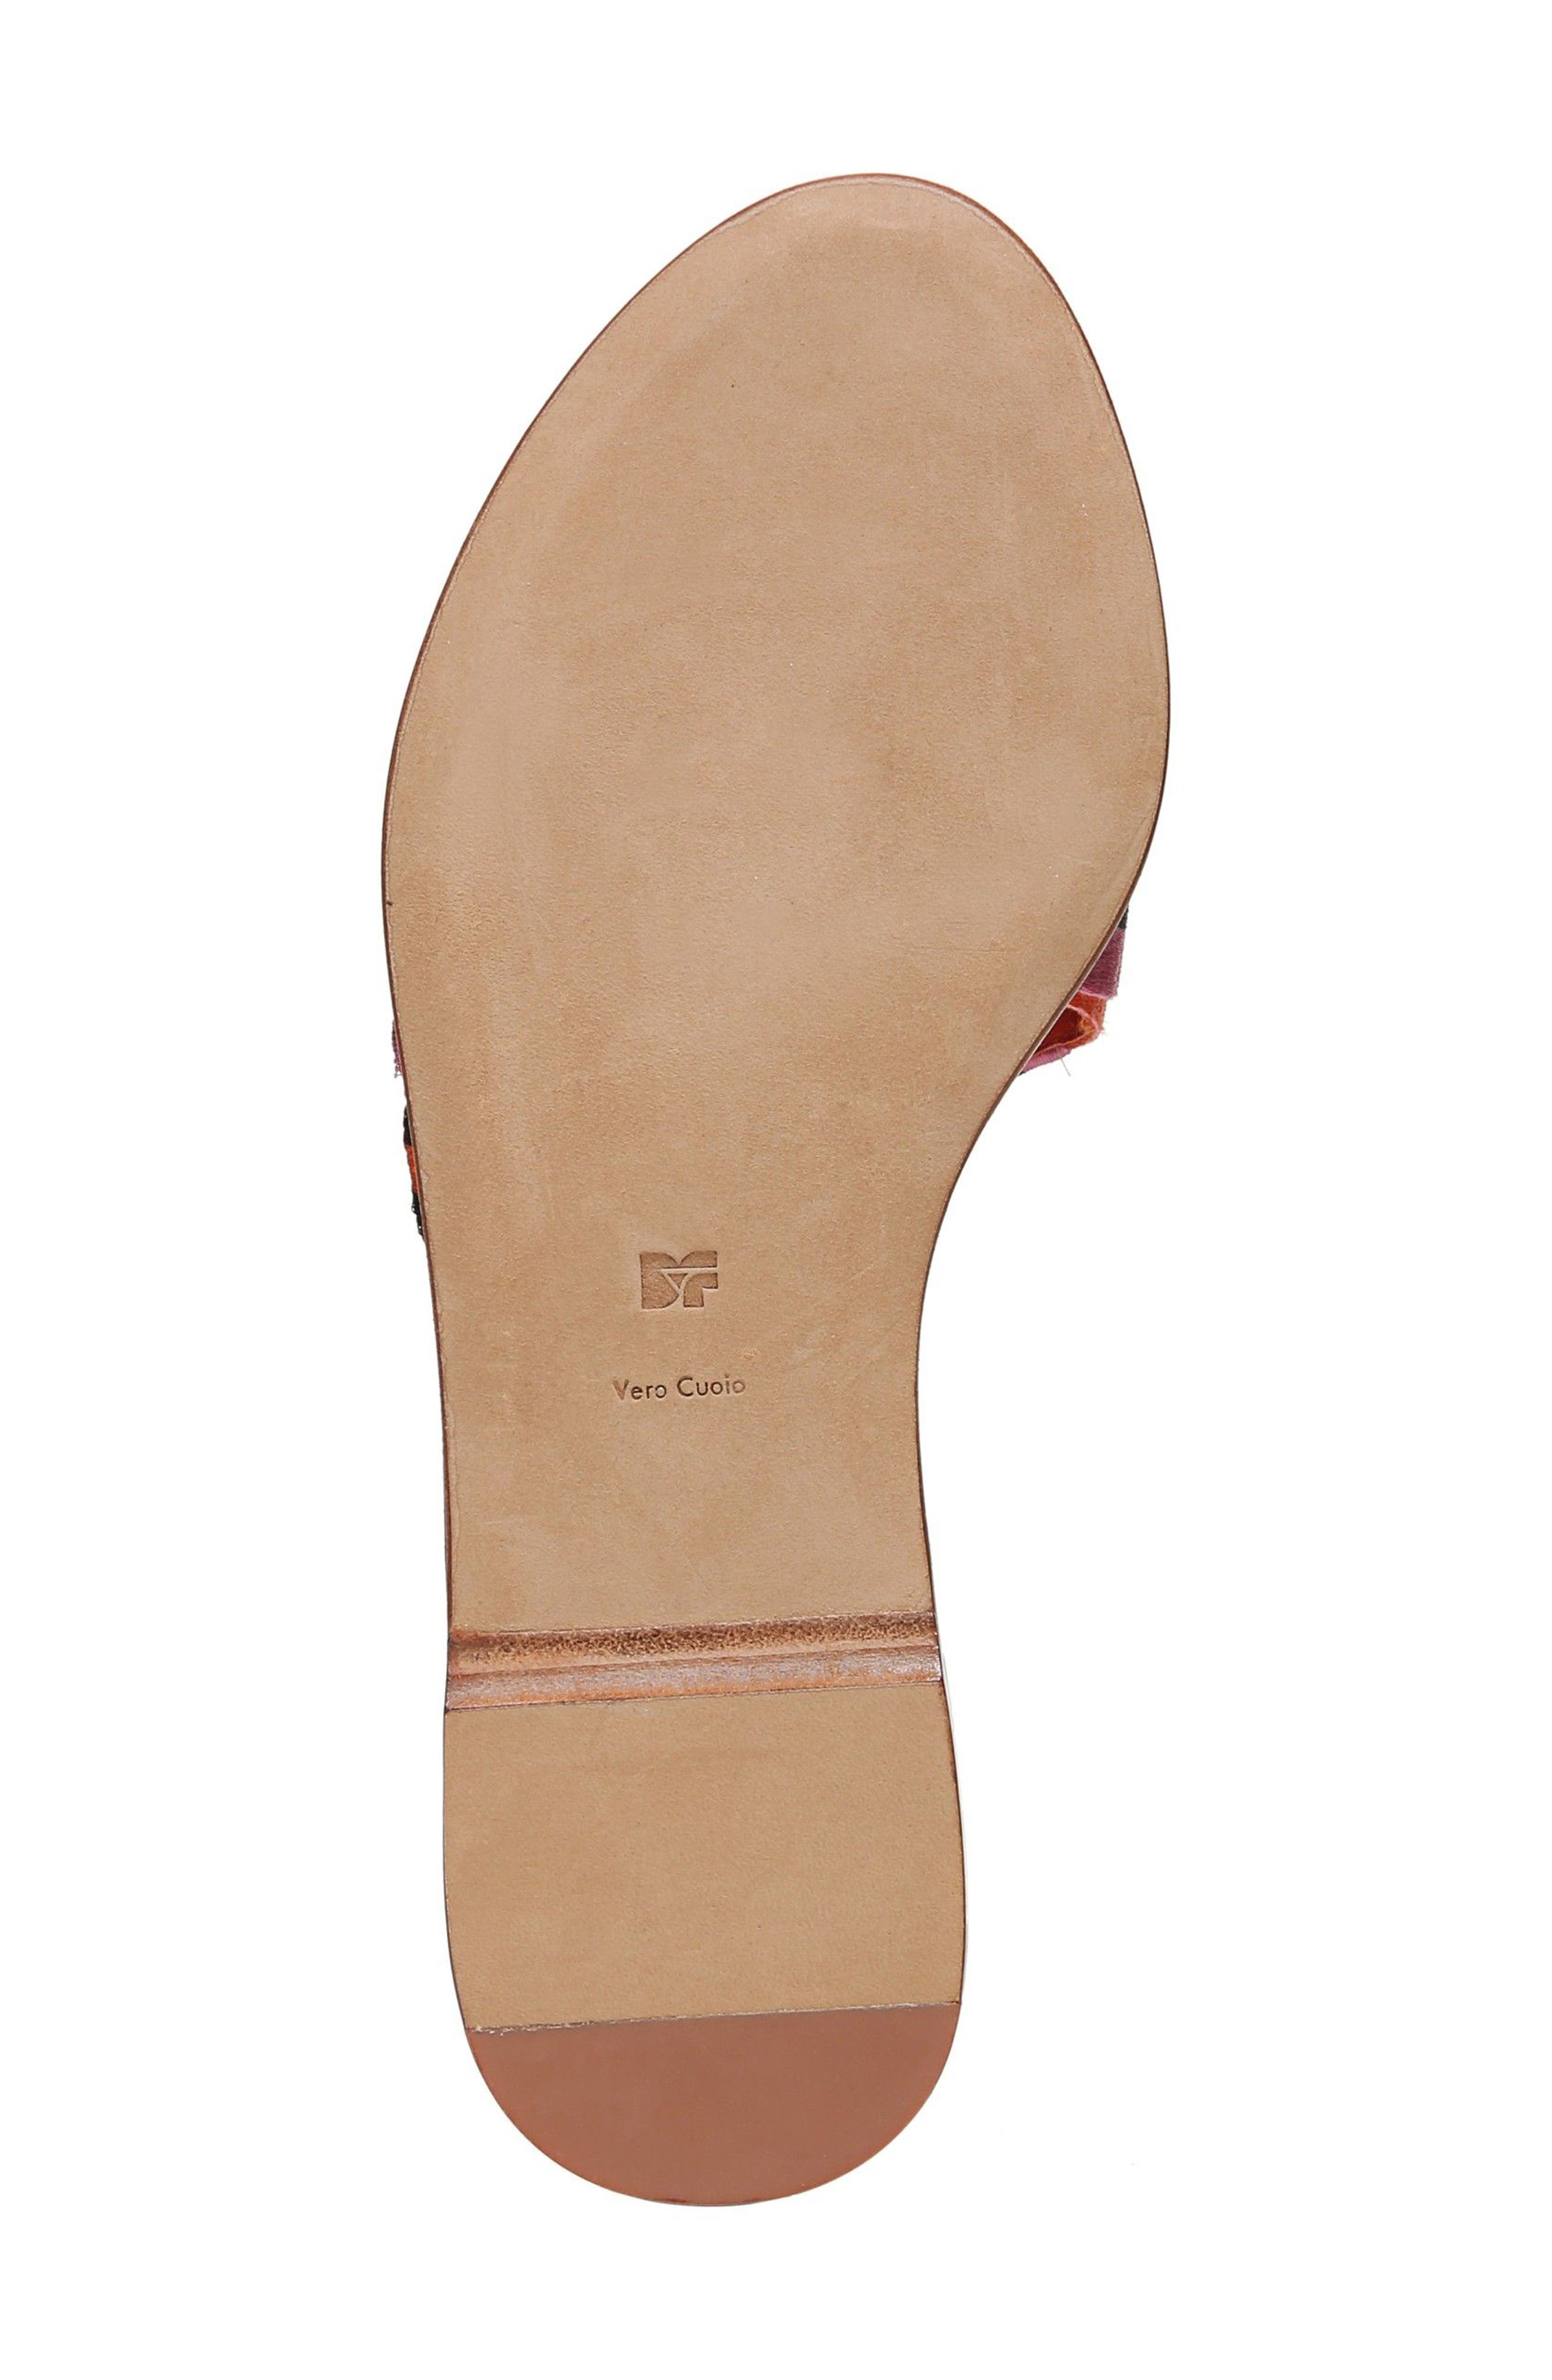 Bella Asymmetrical Slide Sandal,                             Alternate thumbnail 12, color,